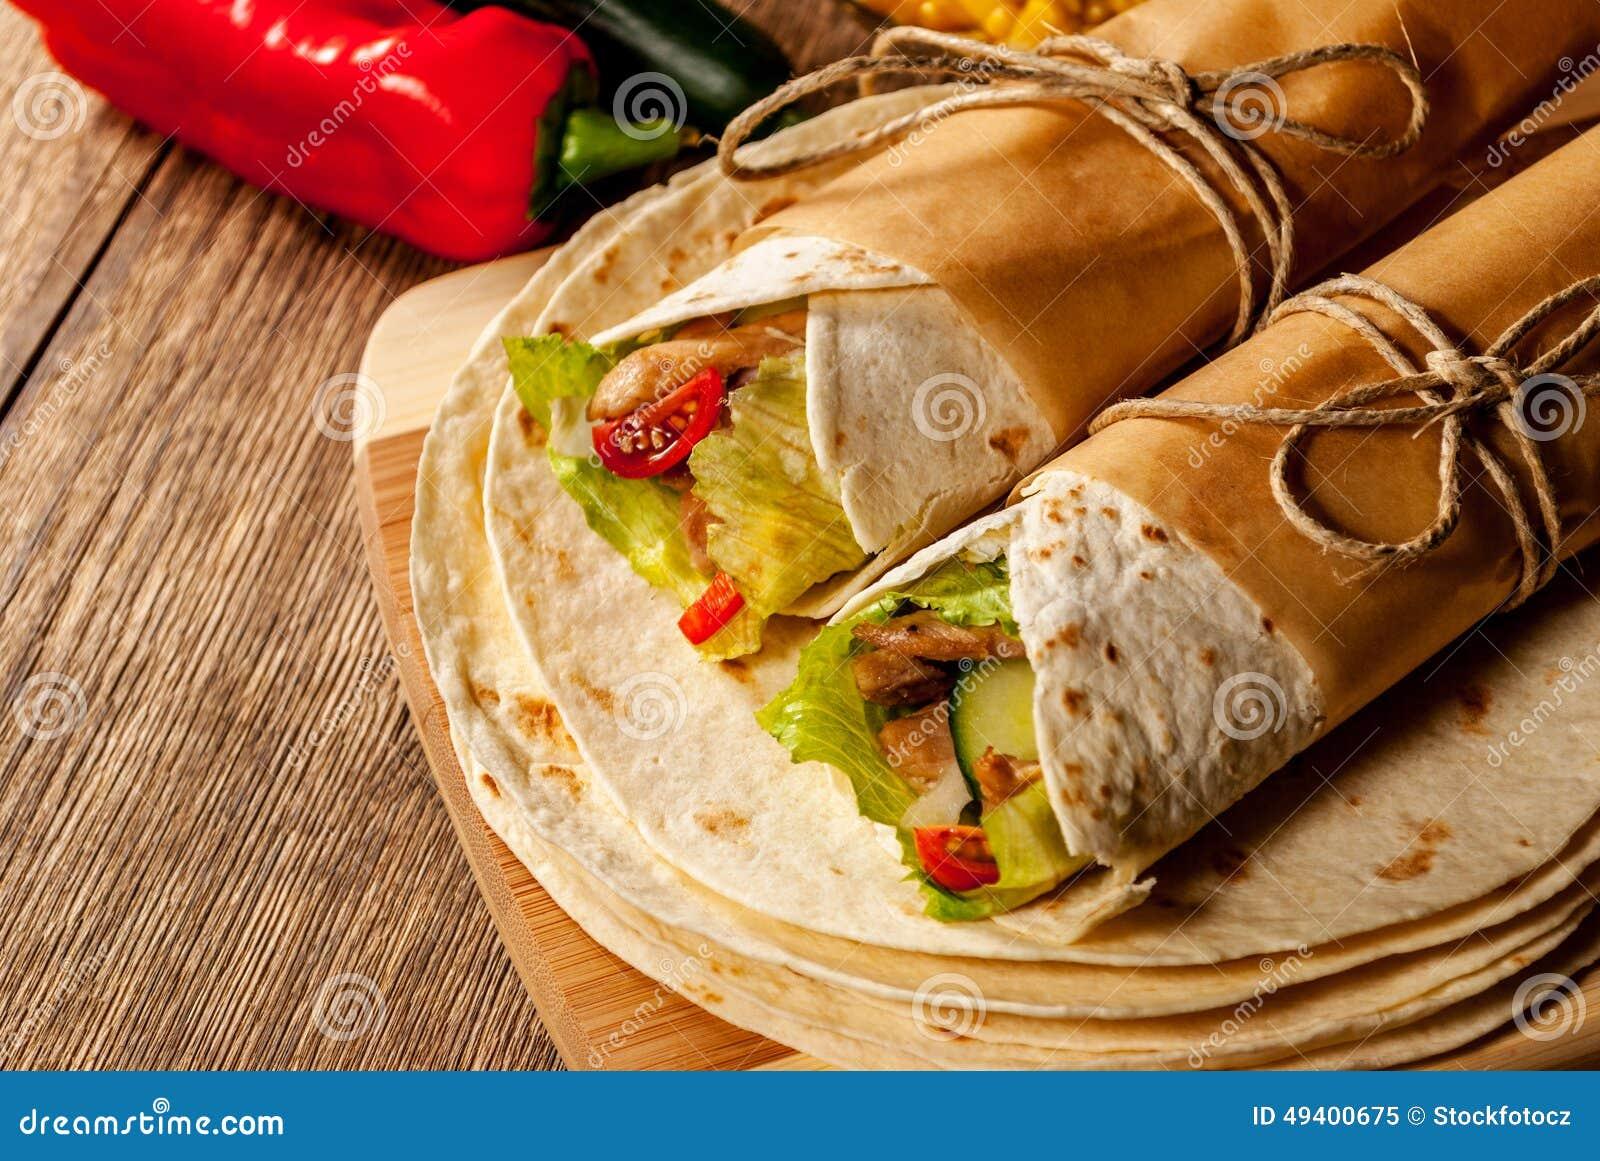 Tortilla opakunek